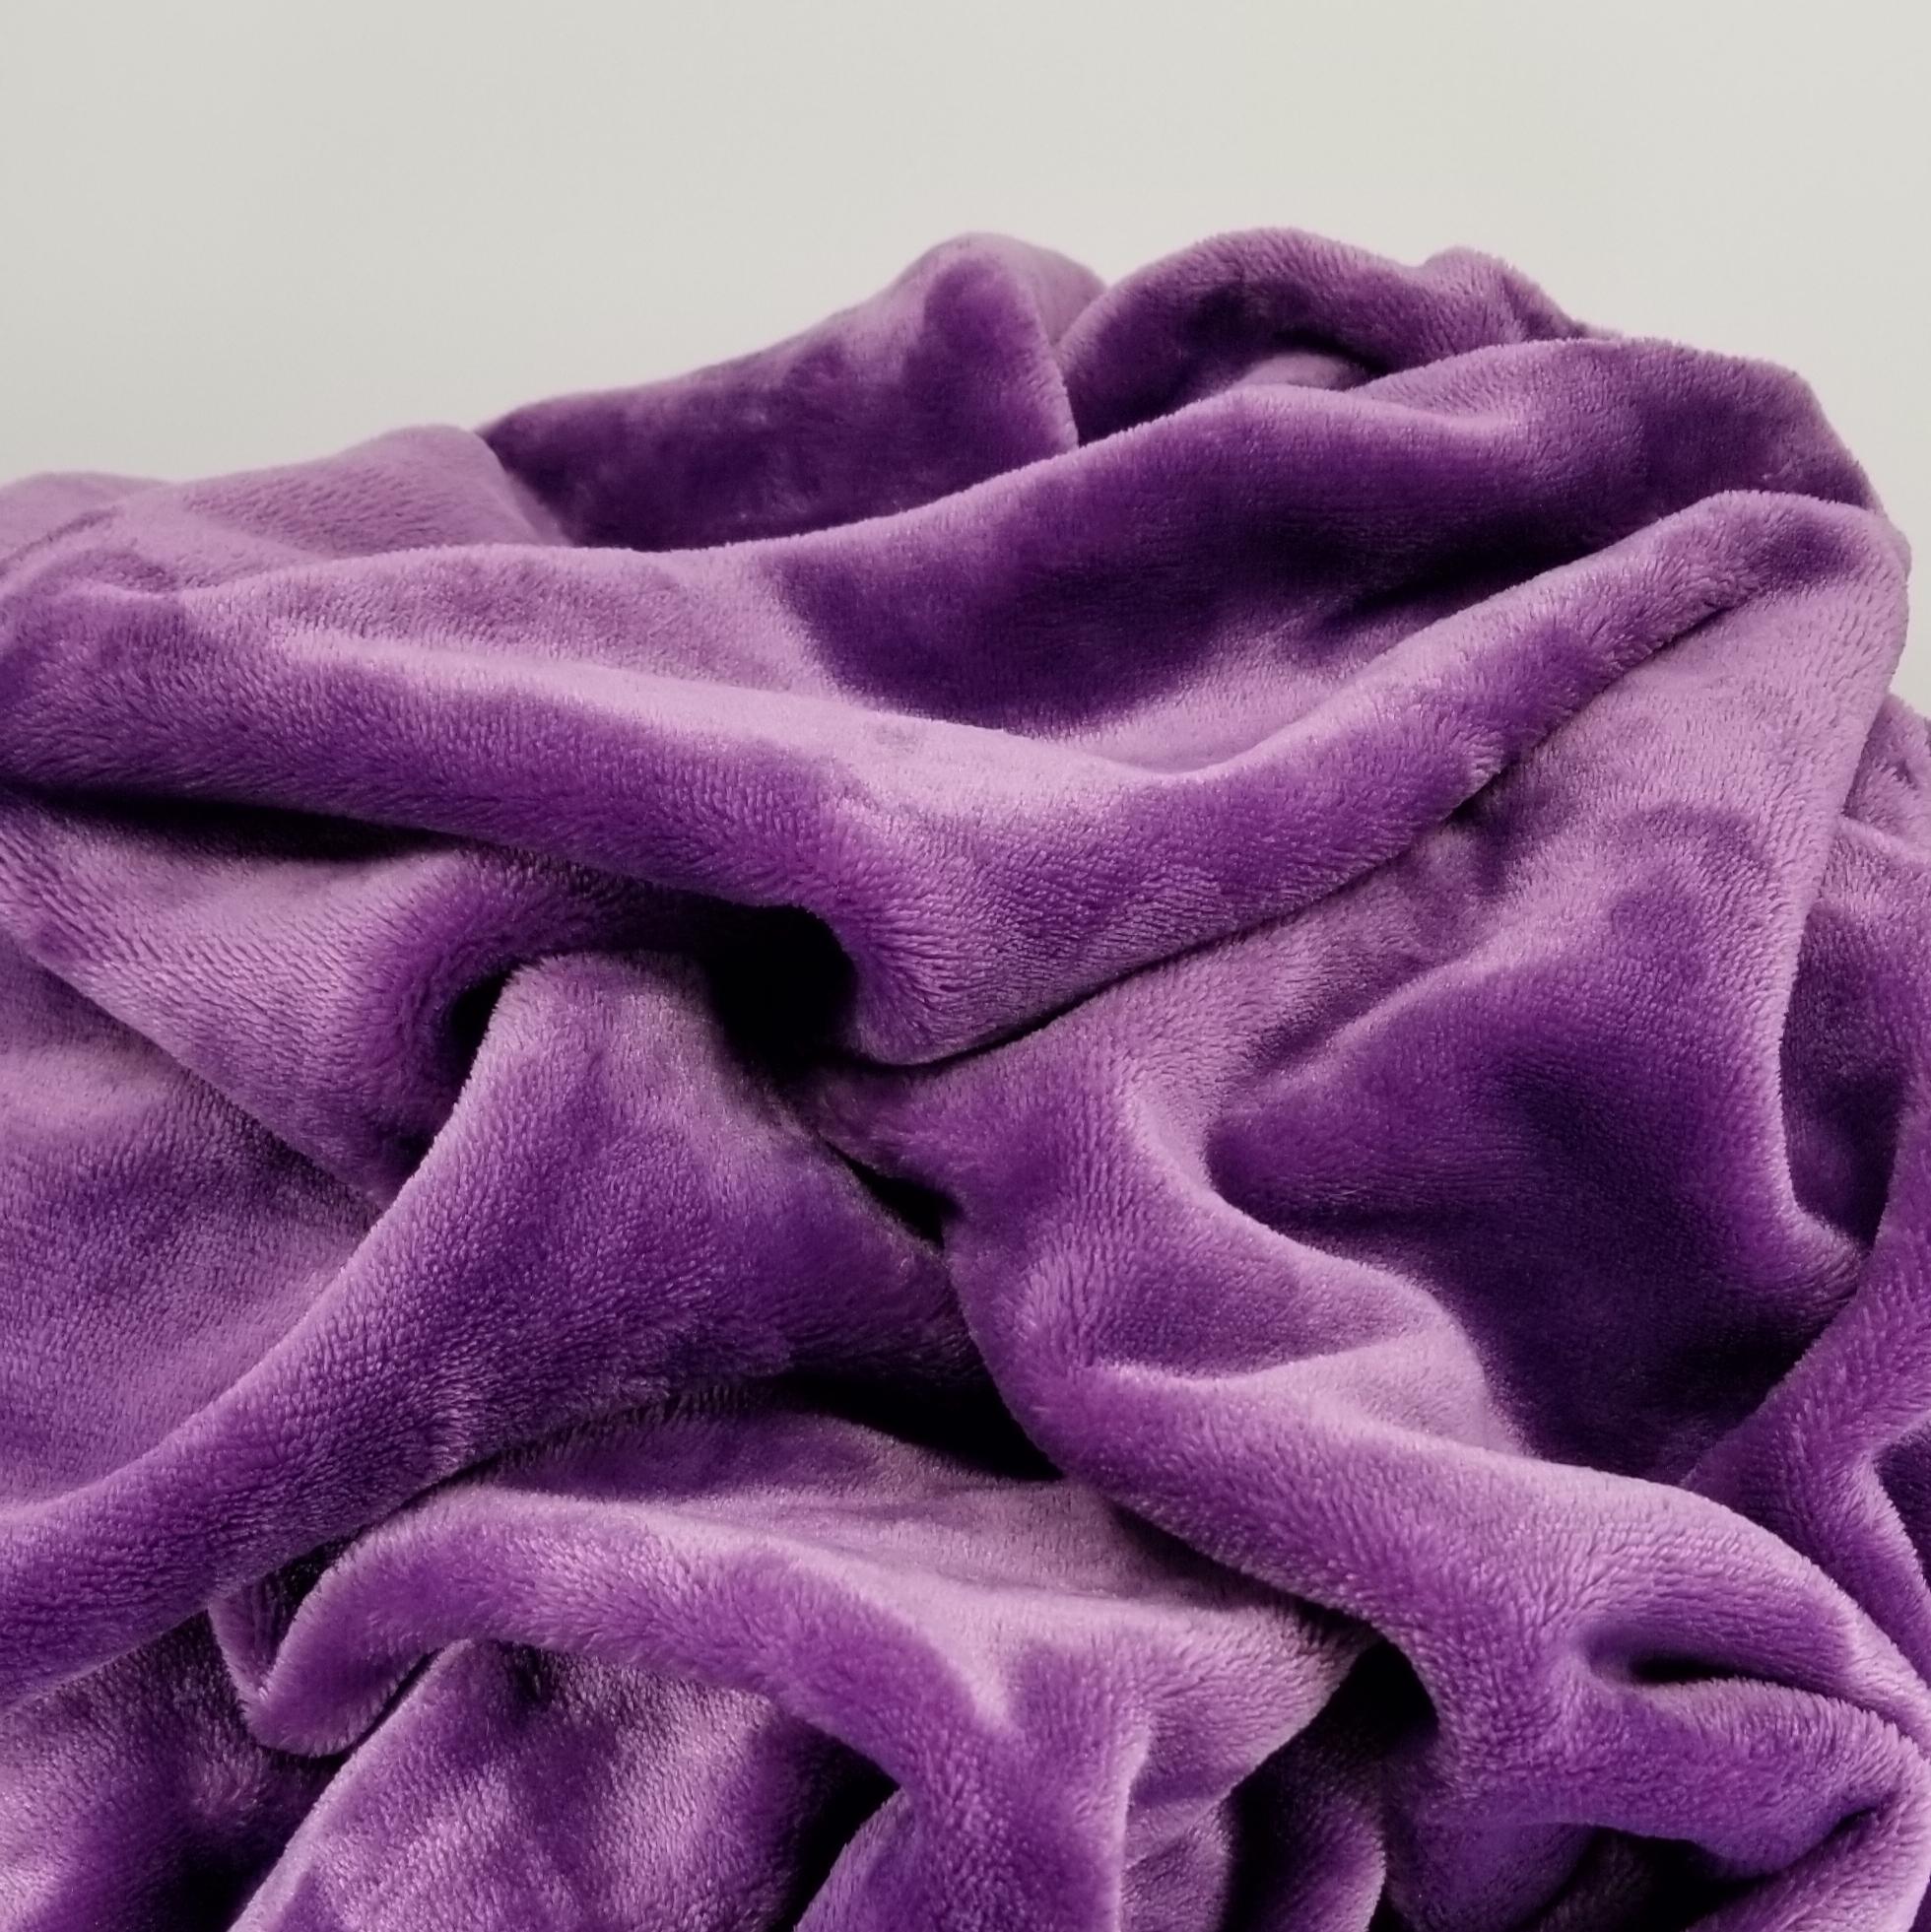 Purple for Epilepsy!